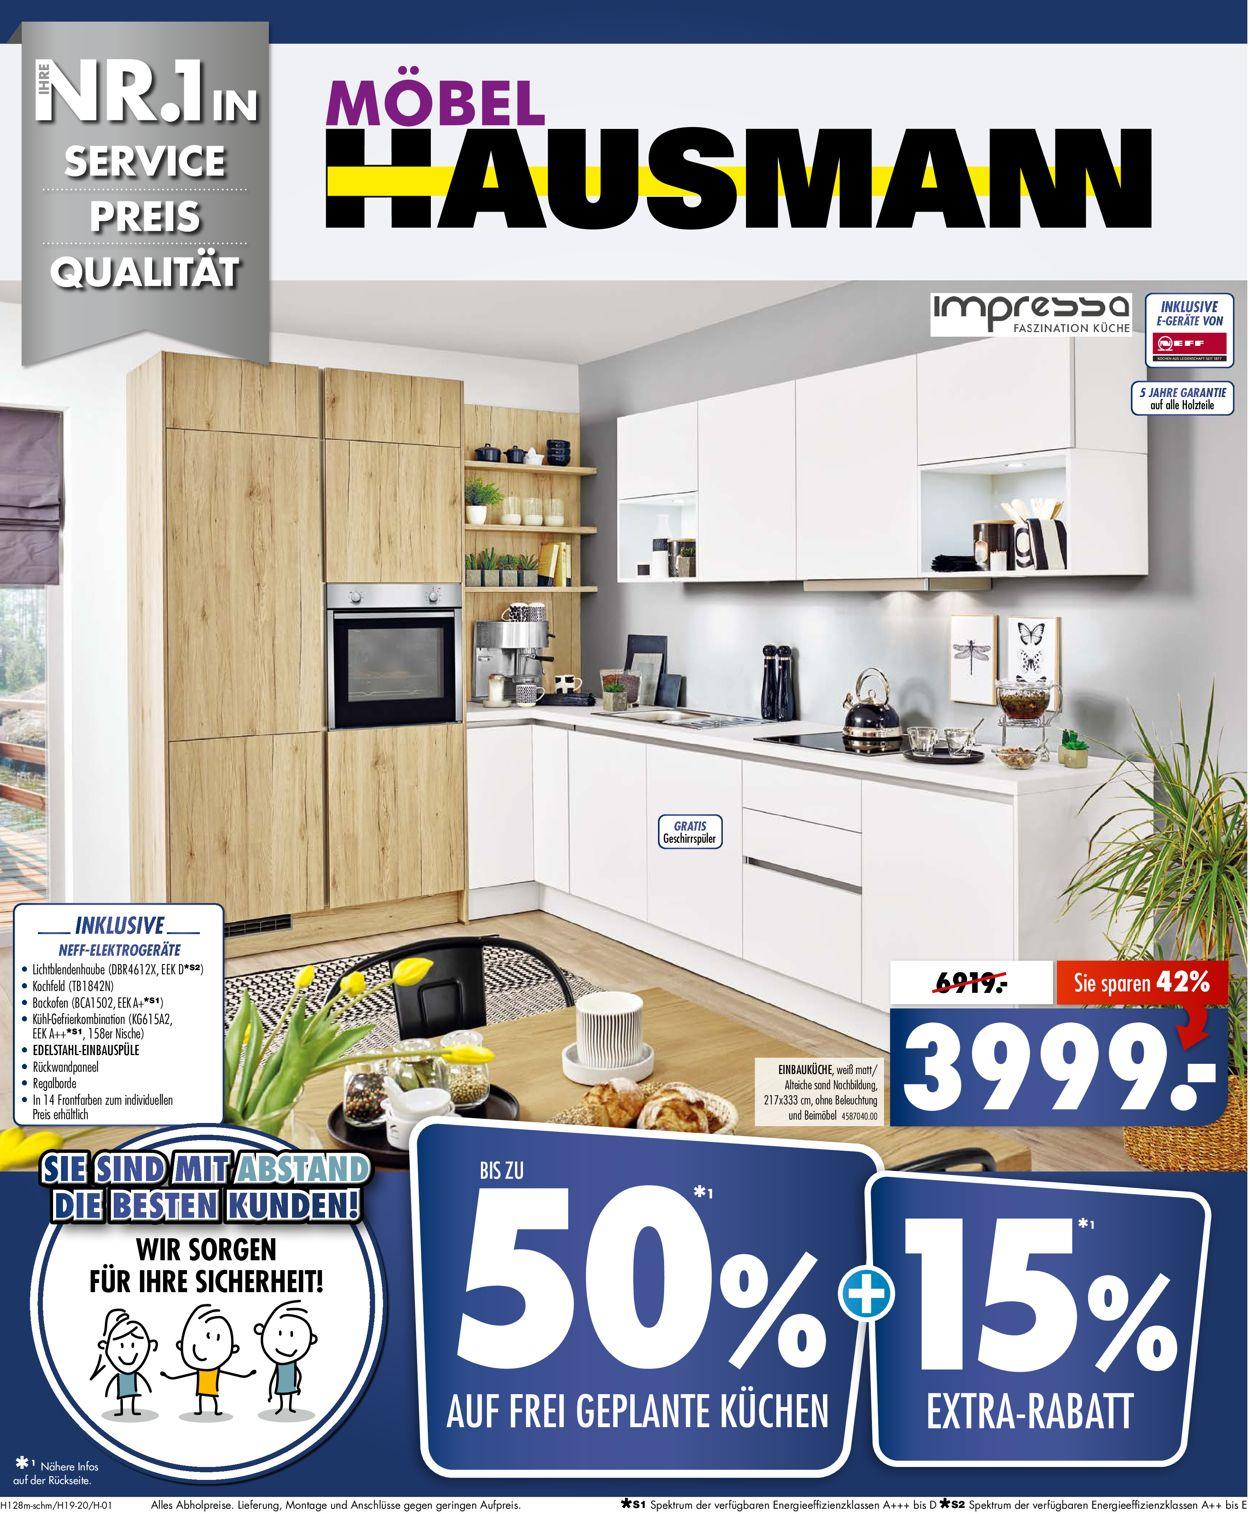 Möbel Hausmann Aktueller Prospekt 17.17 - 17.17.17 - jedewoche